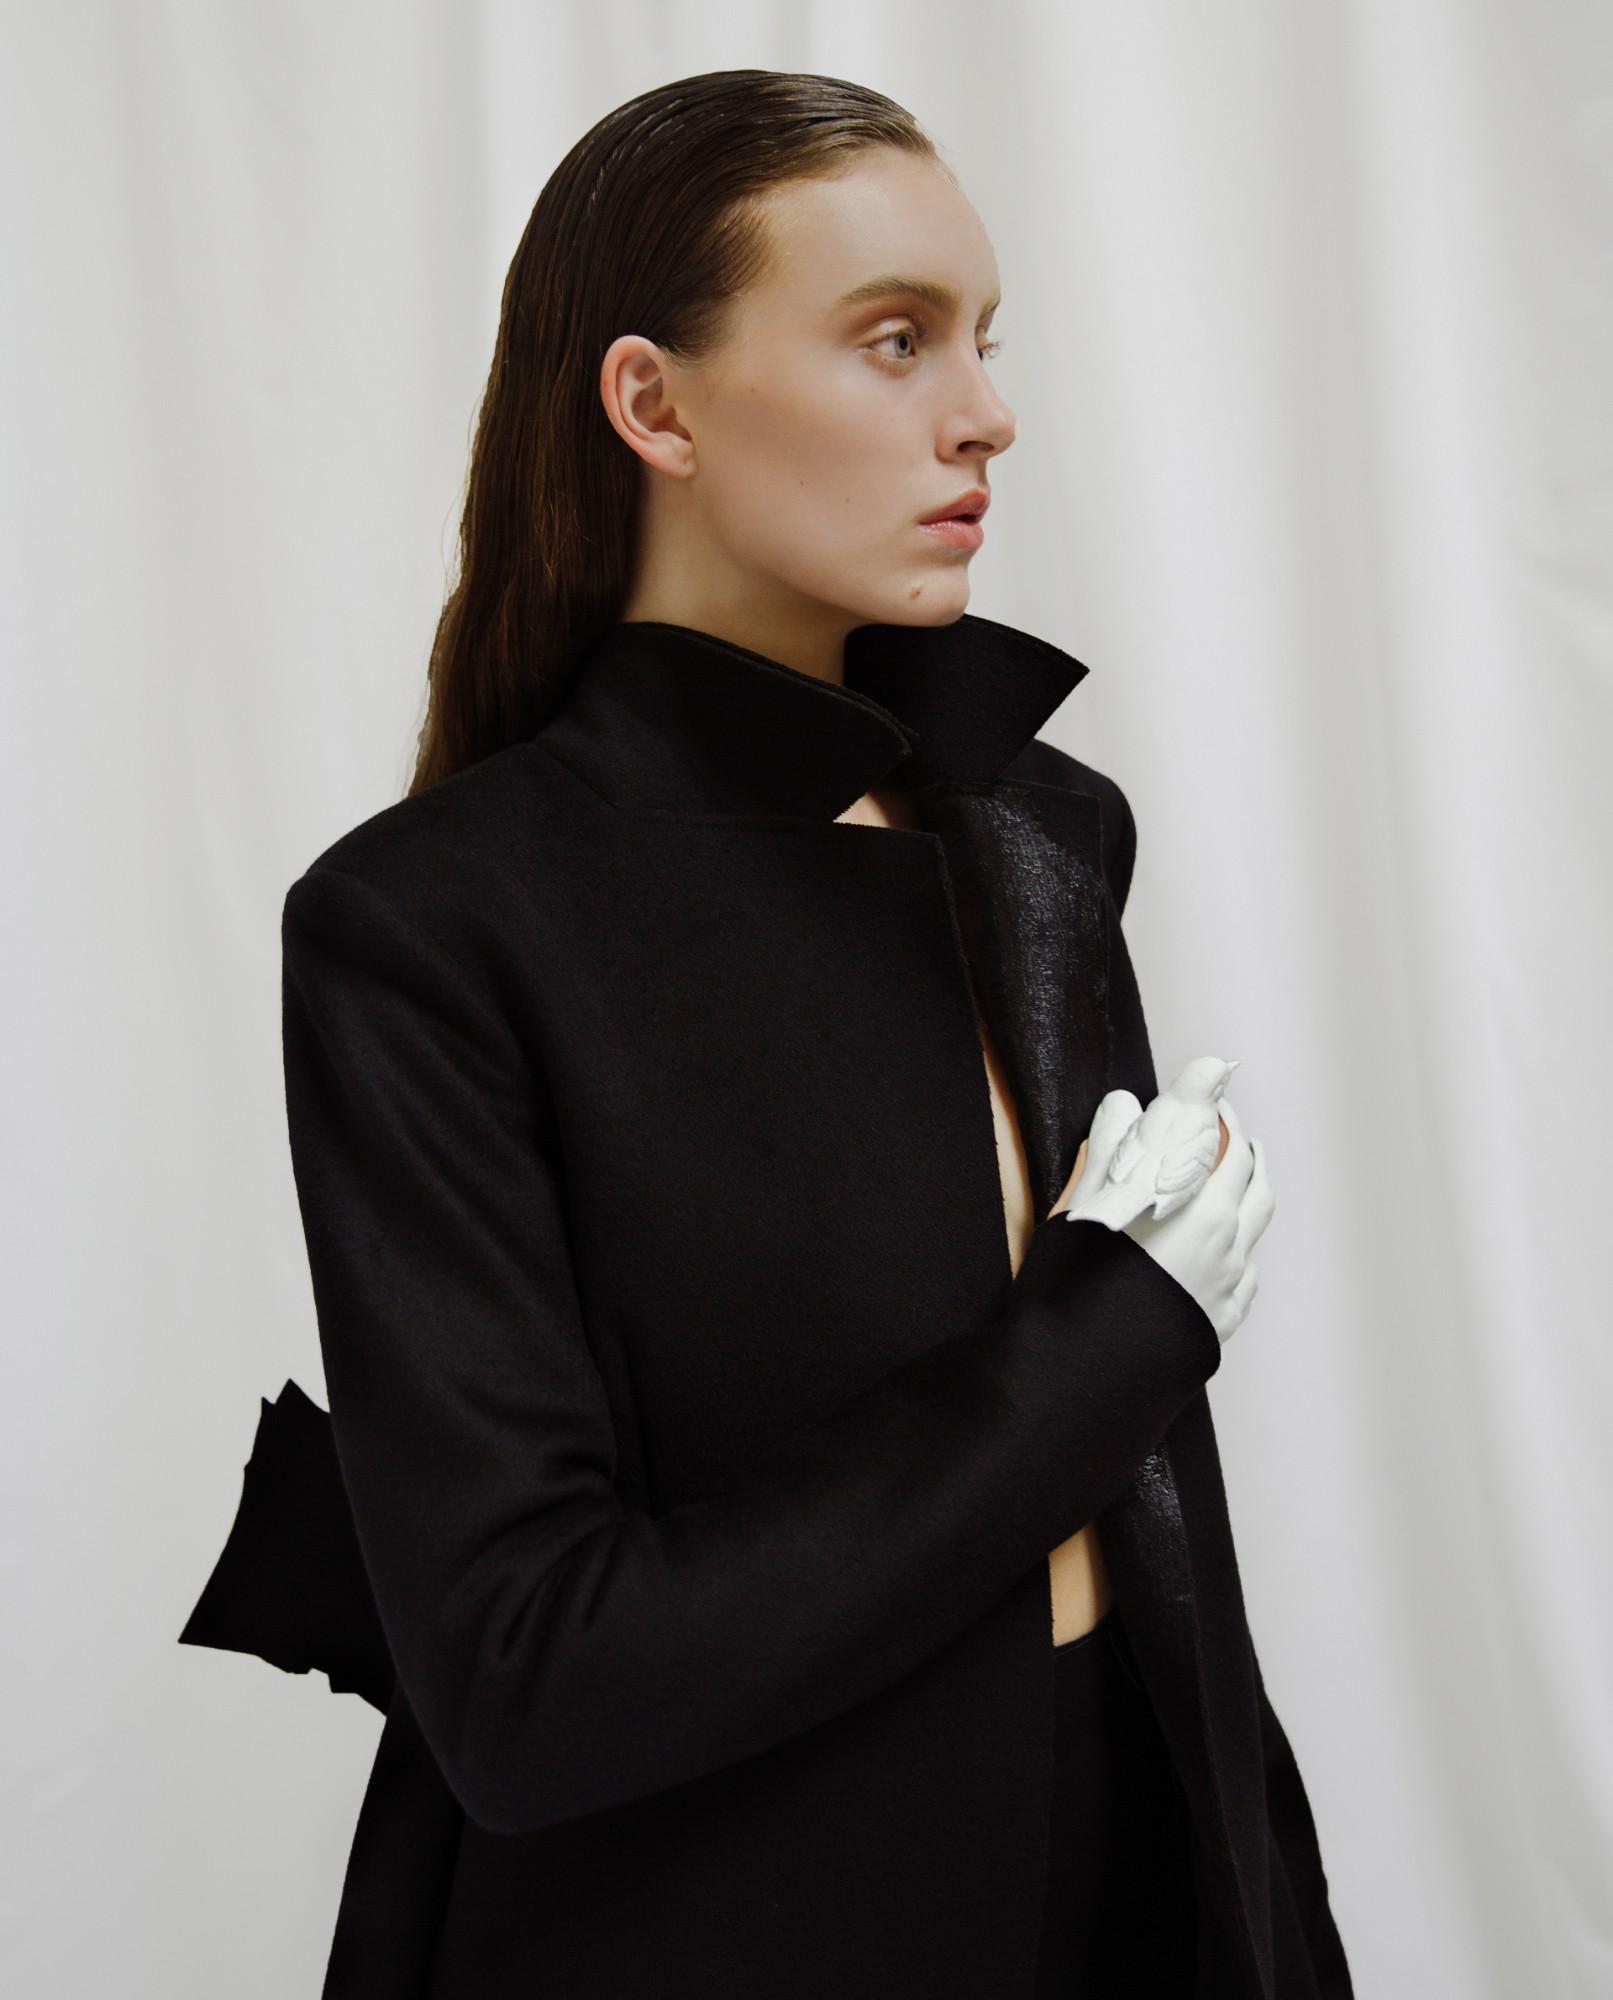 Vulnus Cura, Yvonne Lin, designer, Courtesy of Yvonne Lin,17_